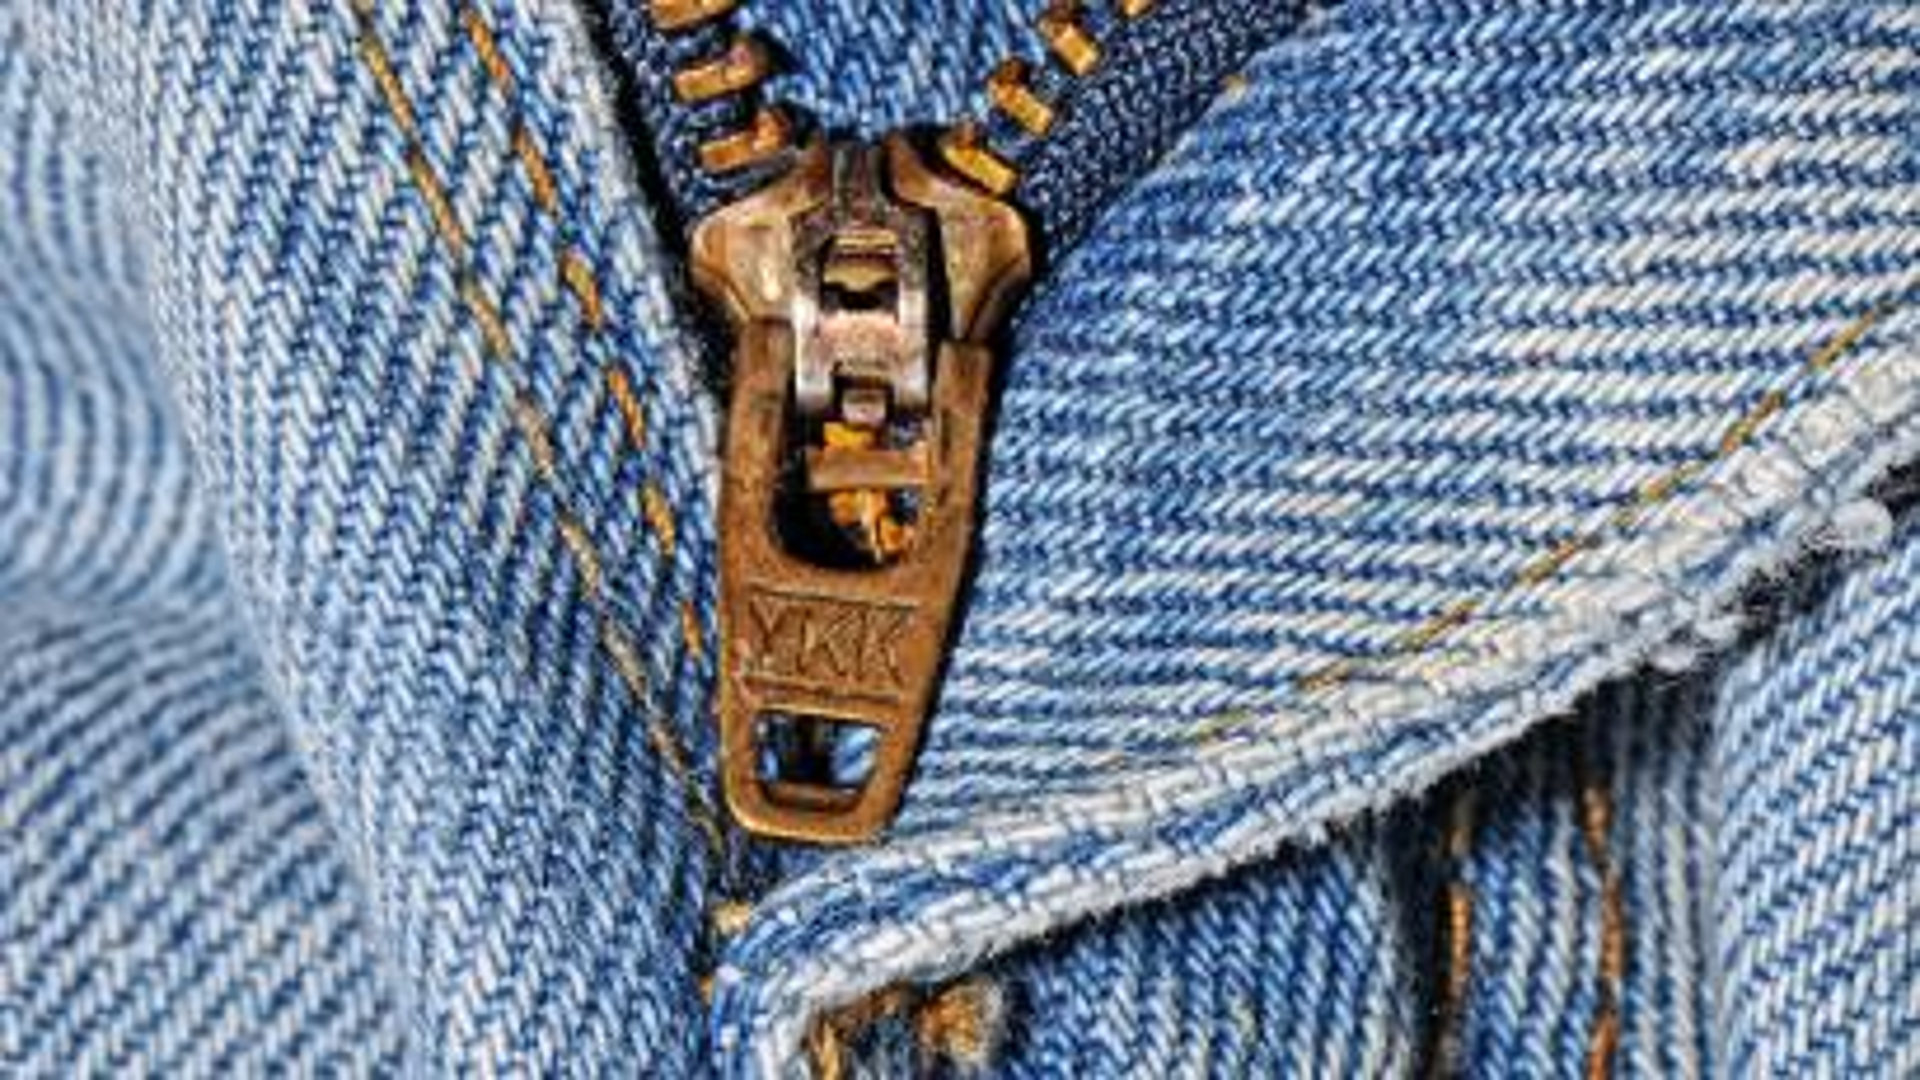 YKK zipper on a pair of jeans